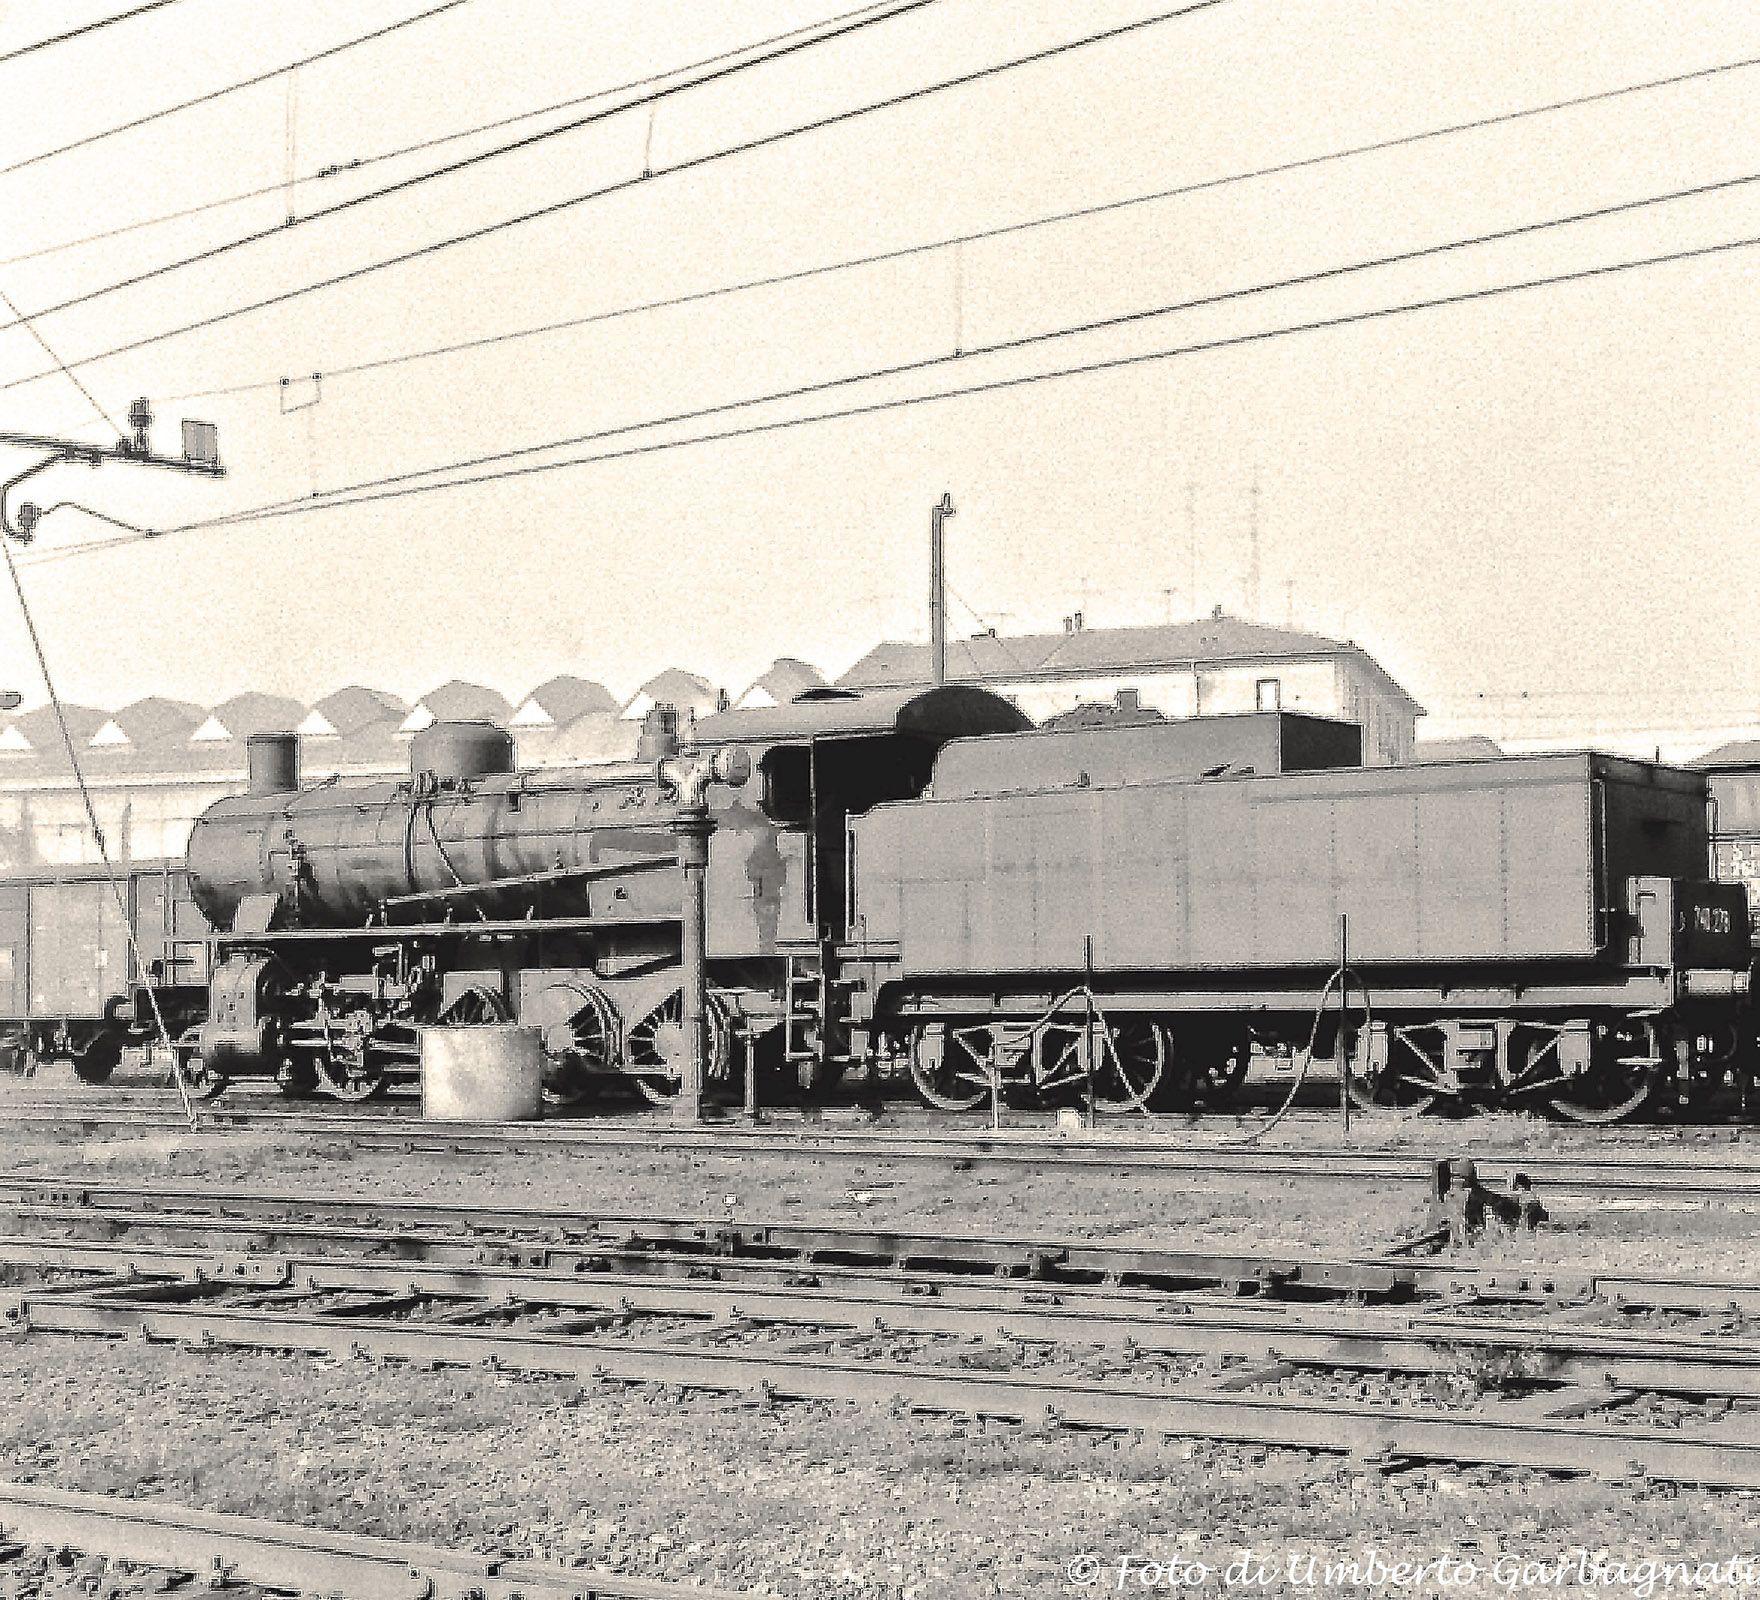 Locomotiva a vapore  FS-740.278 - Deposito lok. di Milano-Greco  (I)  -  24 ott 1965  -               - © Umberto Garbagnati -